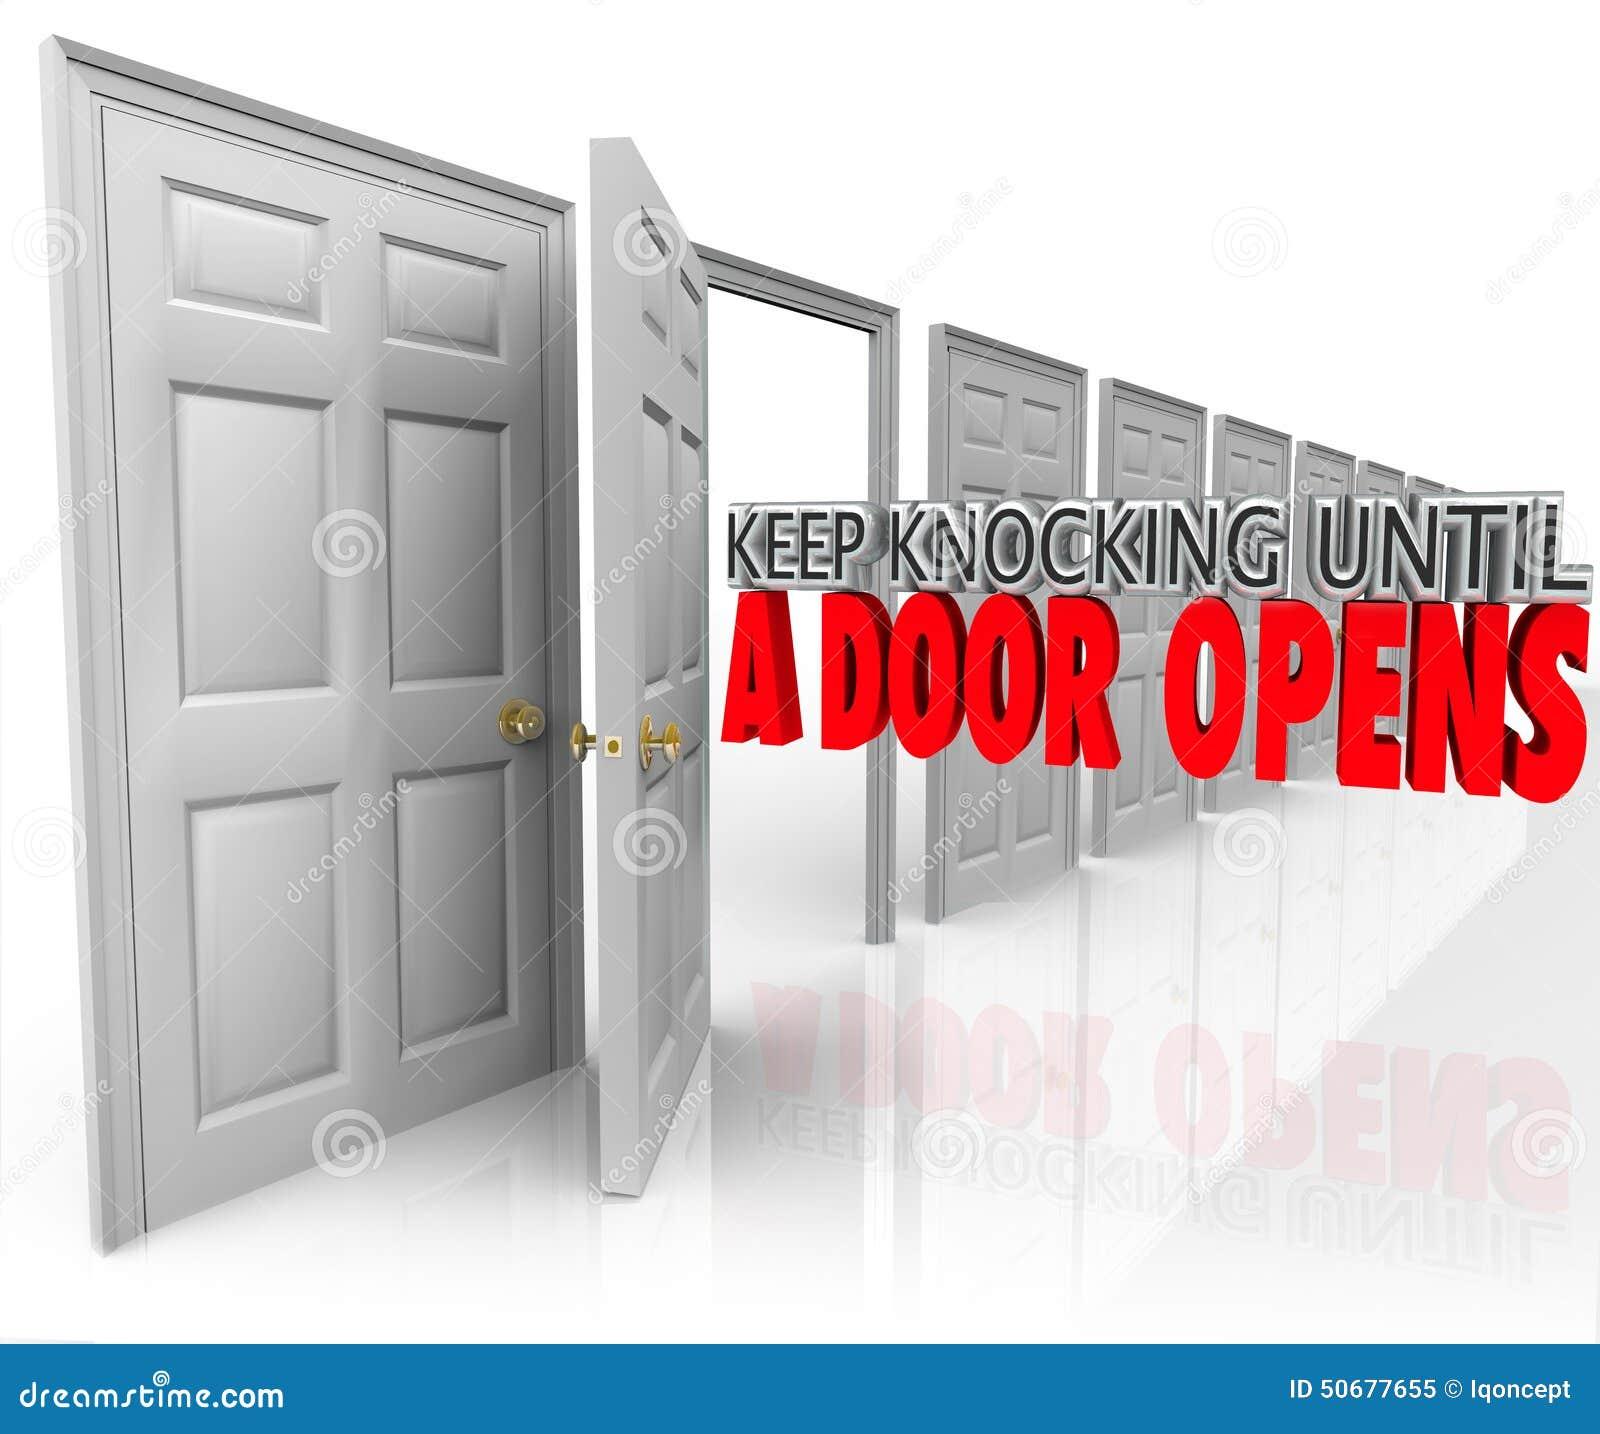 Download 继续敲,直到门打开坚持决心Dedic 库存例证. 插画 包括有 目标, 从未, 开放, 驱动, 解决, 开张 - 50677655